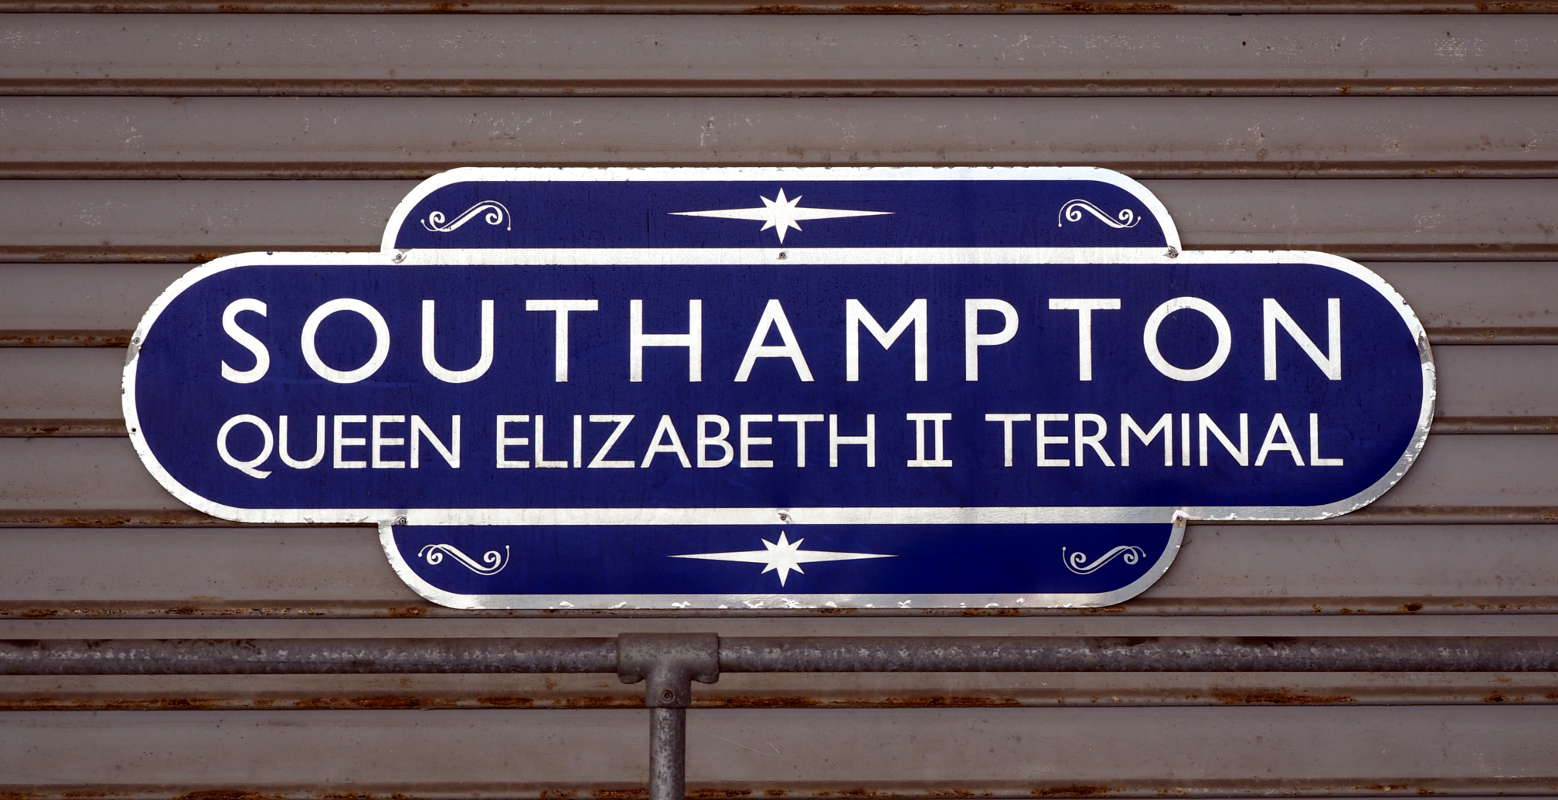 Liegeplatz AIDAprima Southampton am Queen Elisabeth 2 Terminal